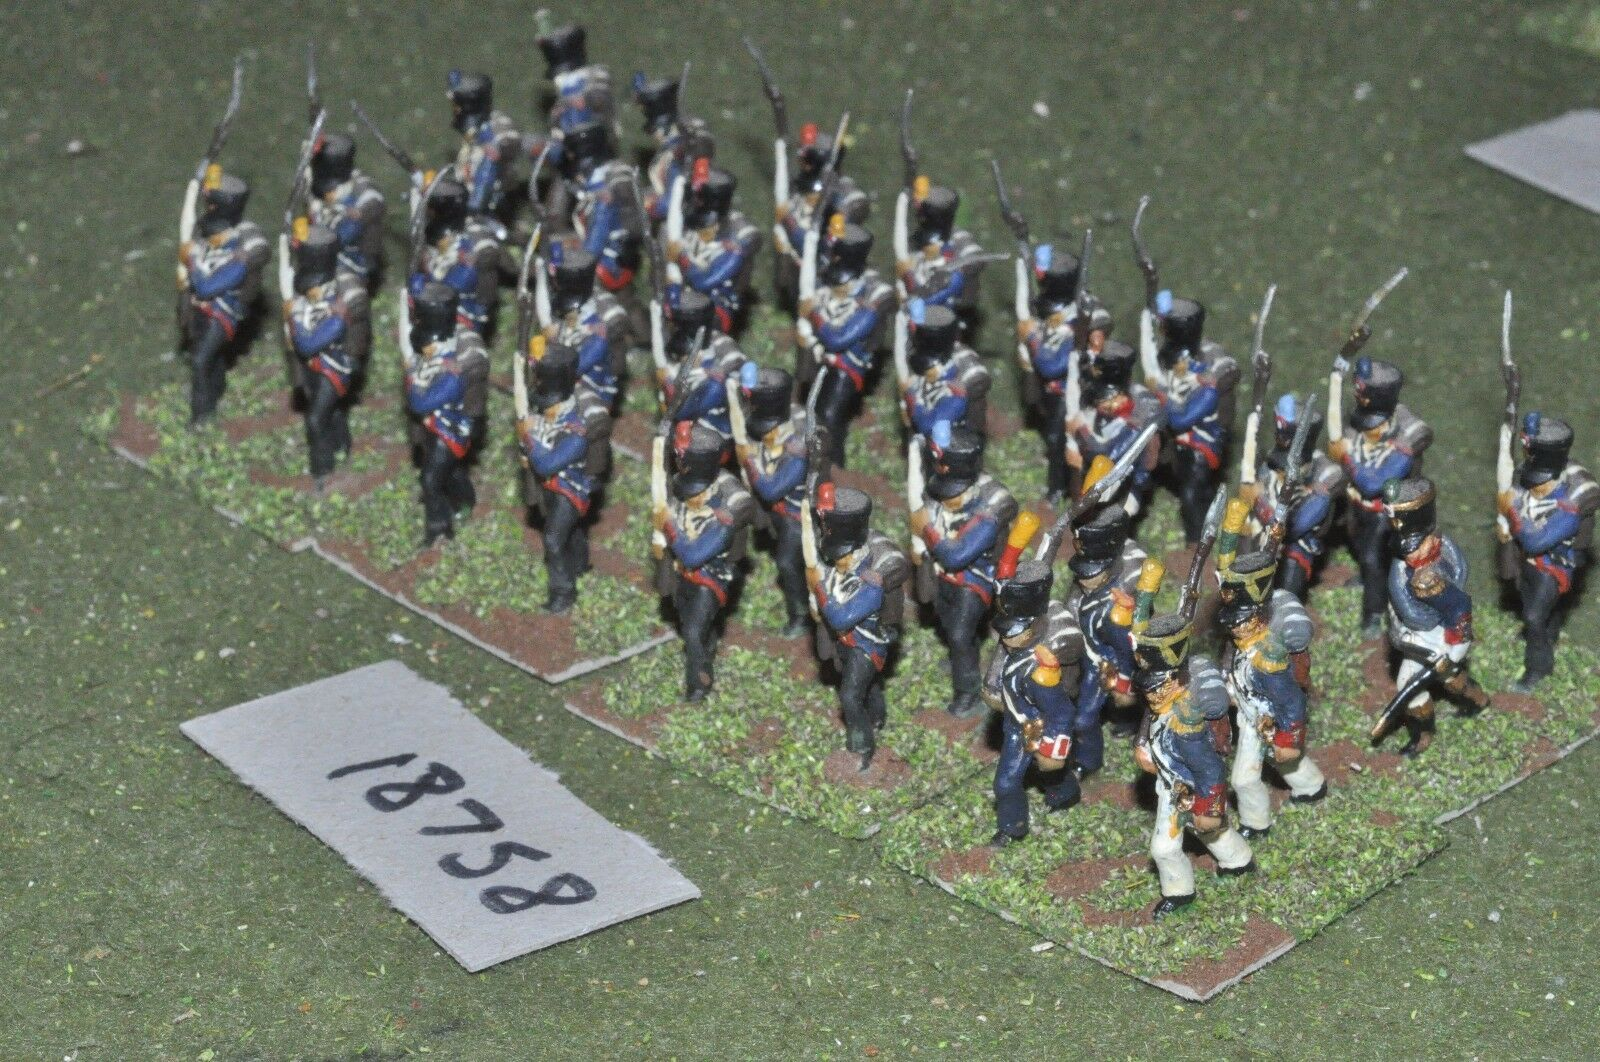 25 mm napoléoniennes français-Vieille Garde 28 Figues-INF Figues-INF Figues-INF (18756) 5ac4c8